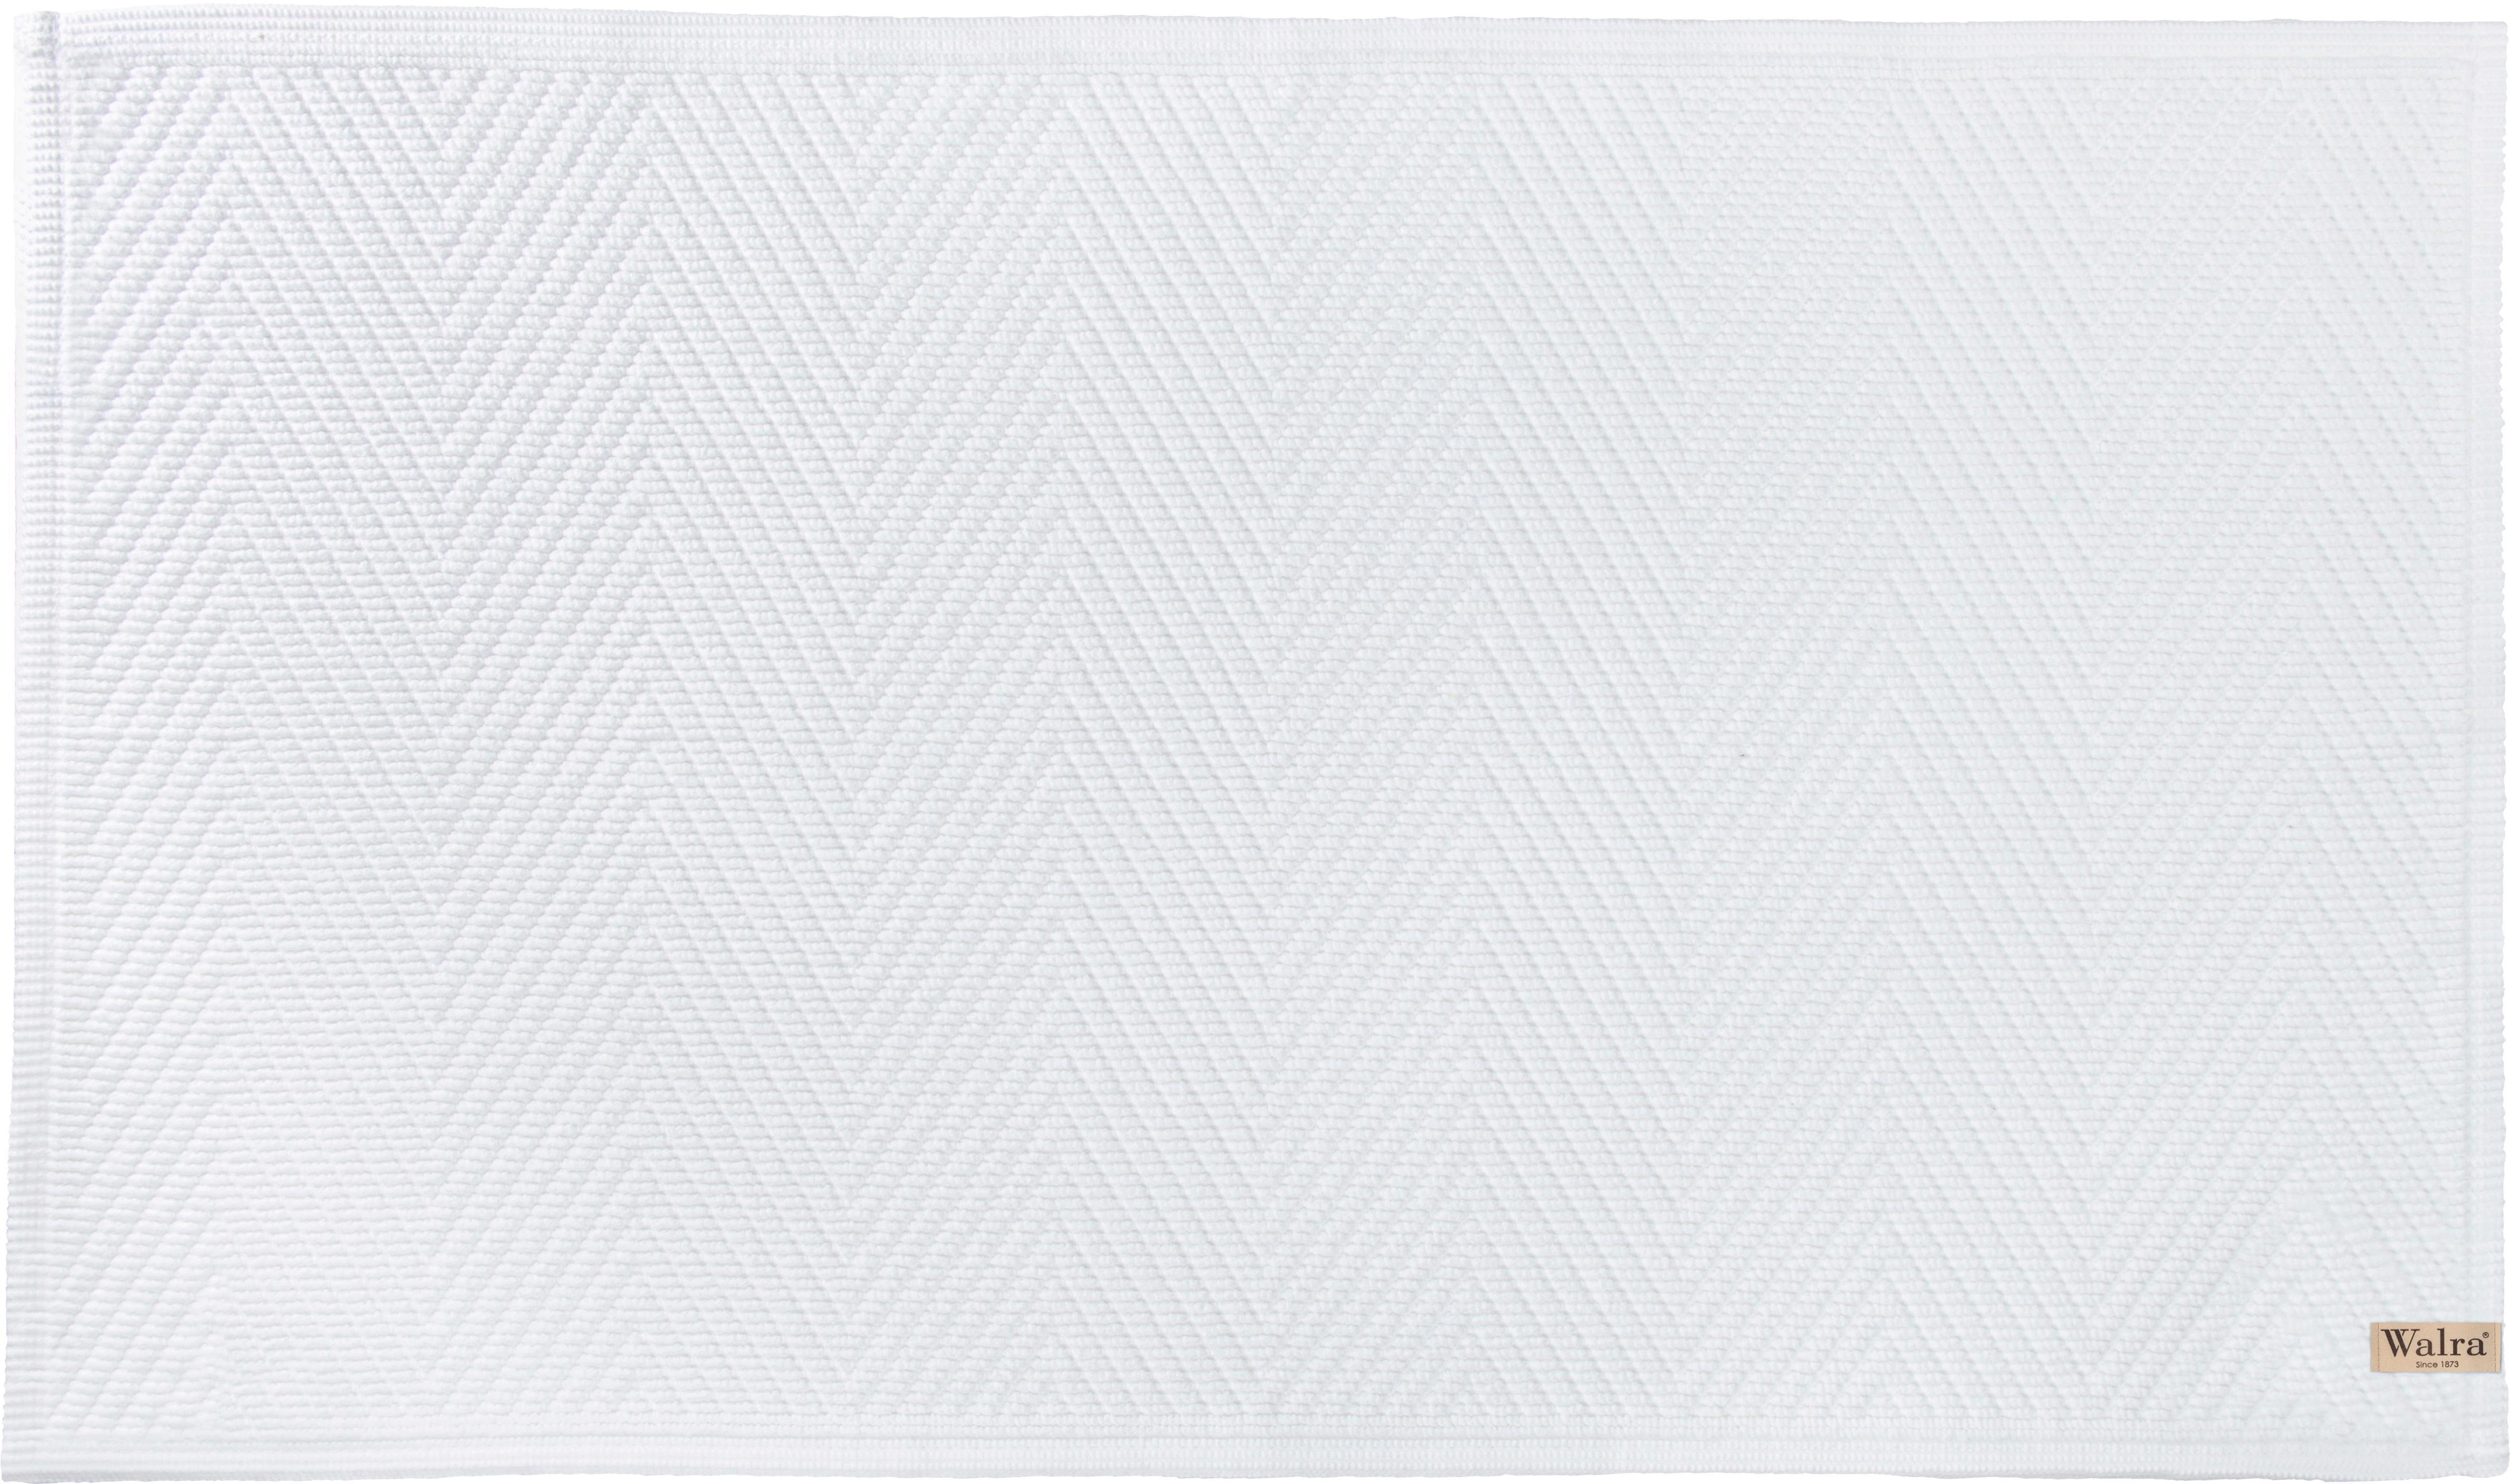 Alfombrilla de baño Soft Cotton, Algodón, Blanco, An 60 x L 100 cm